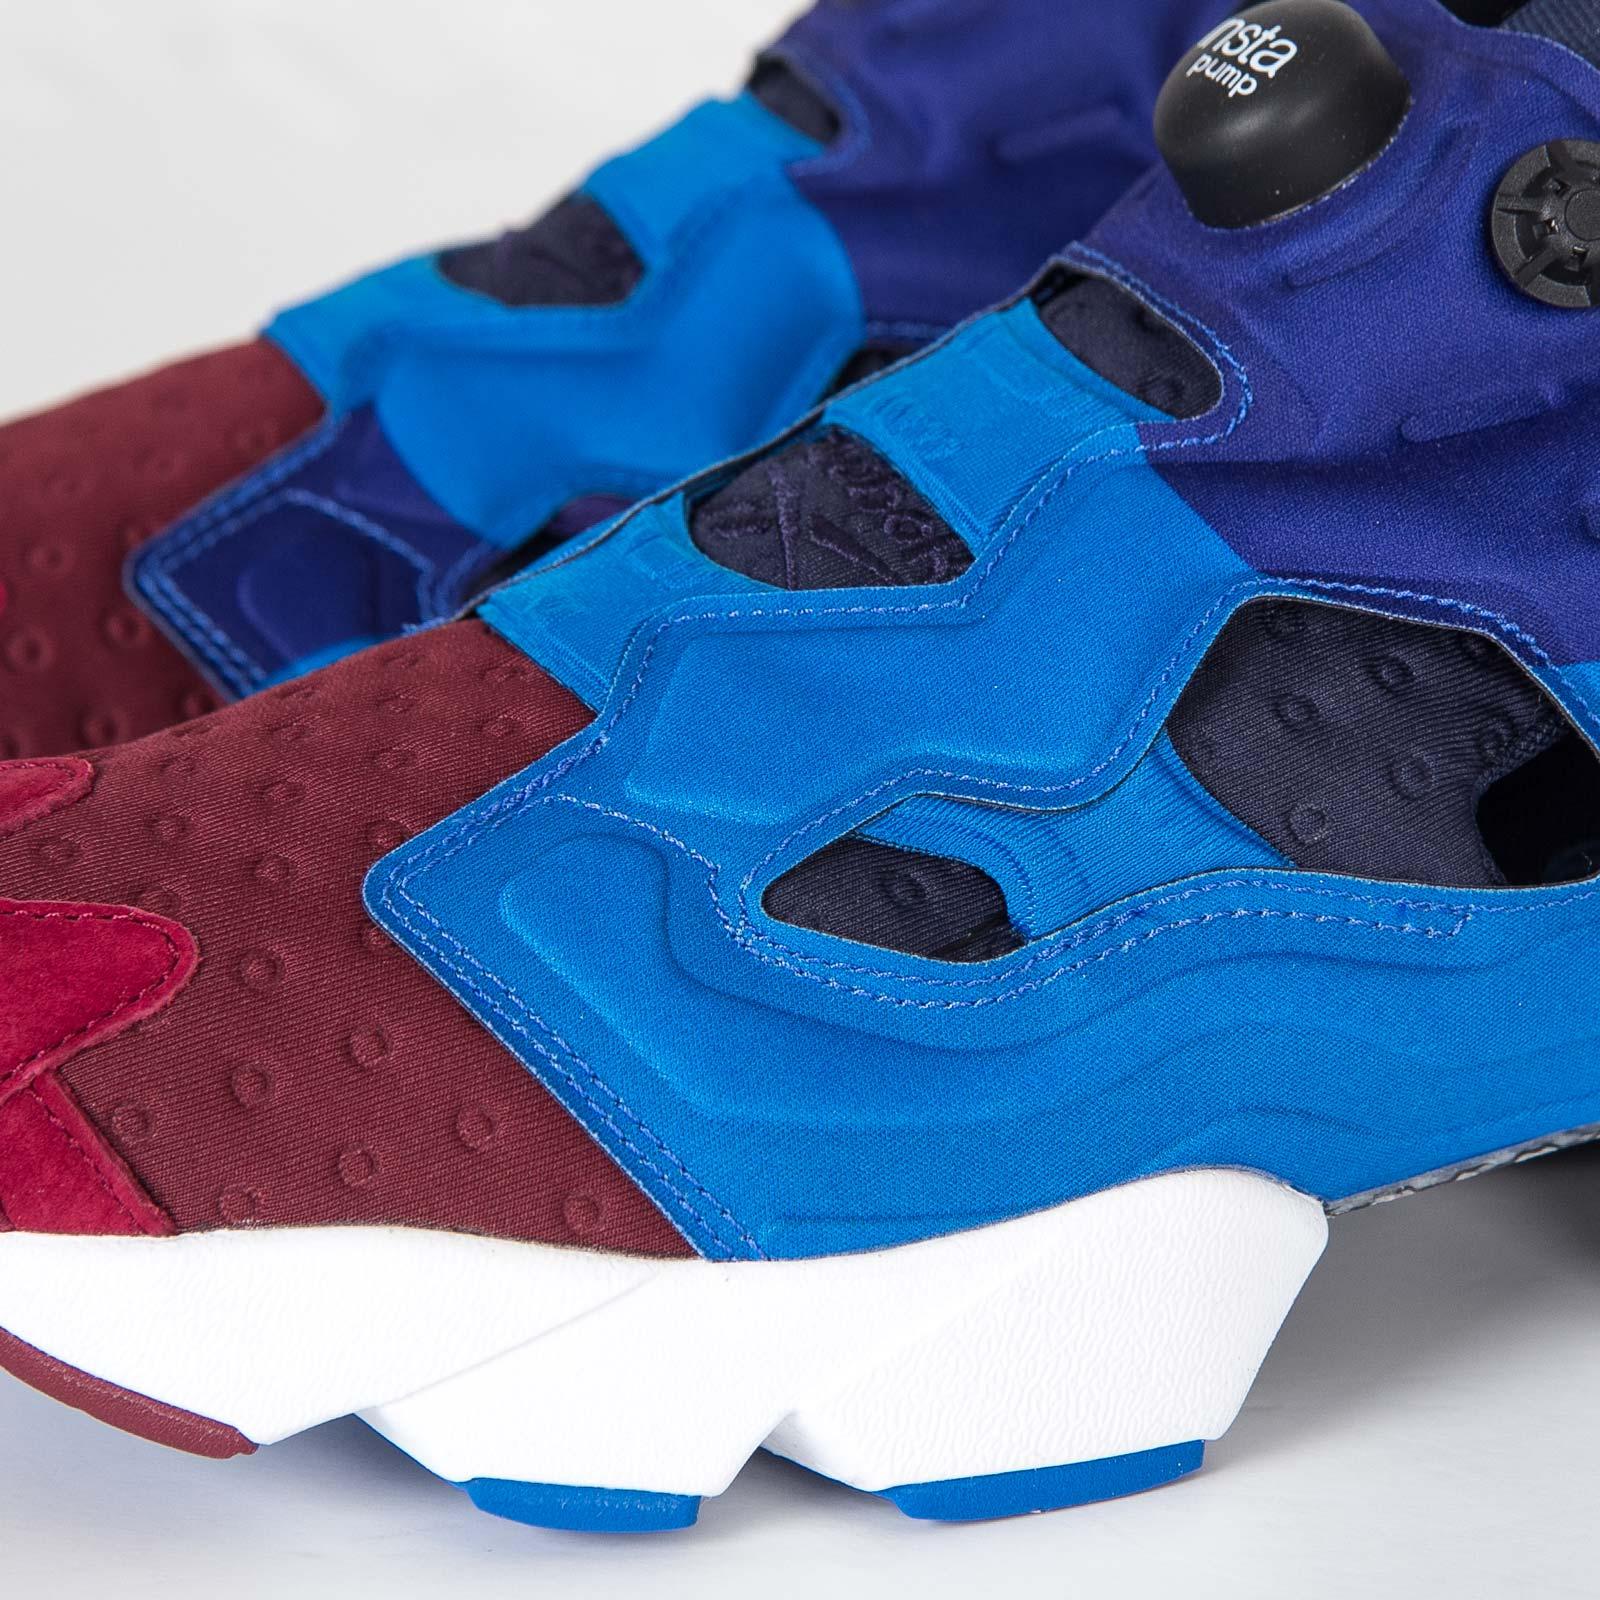 00eb5c0e4625 Reebok Instapump Fury Asym - V67792 - Sneakersnstuff